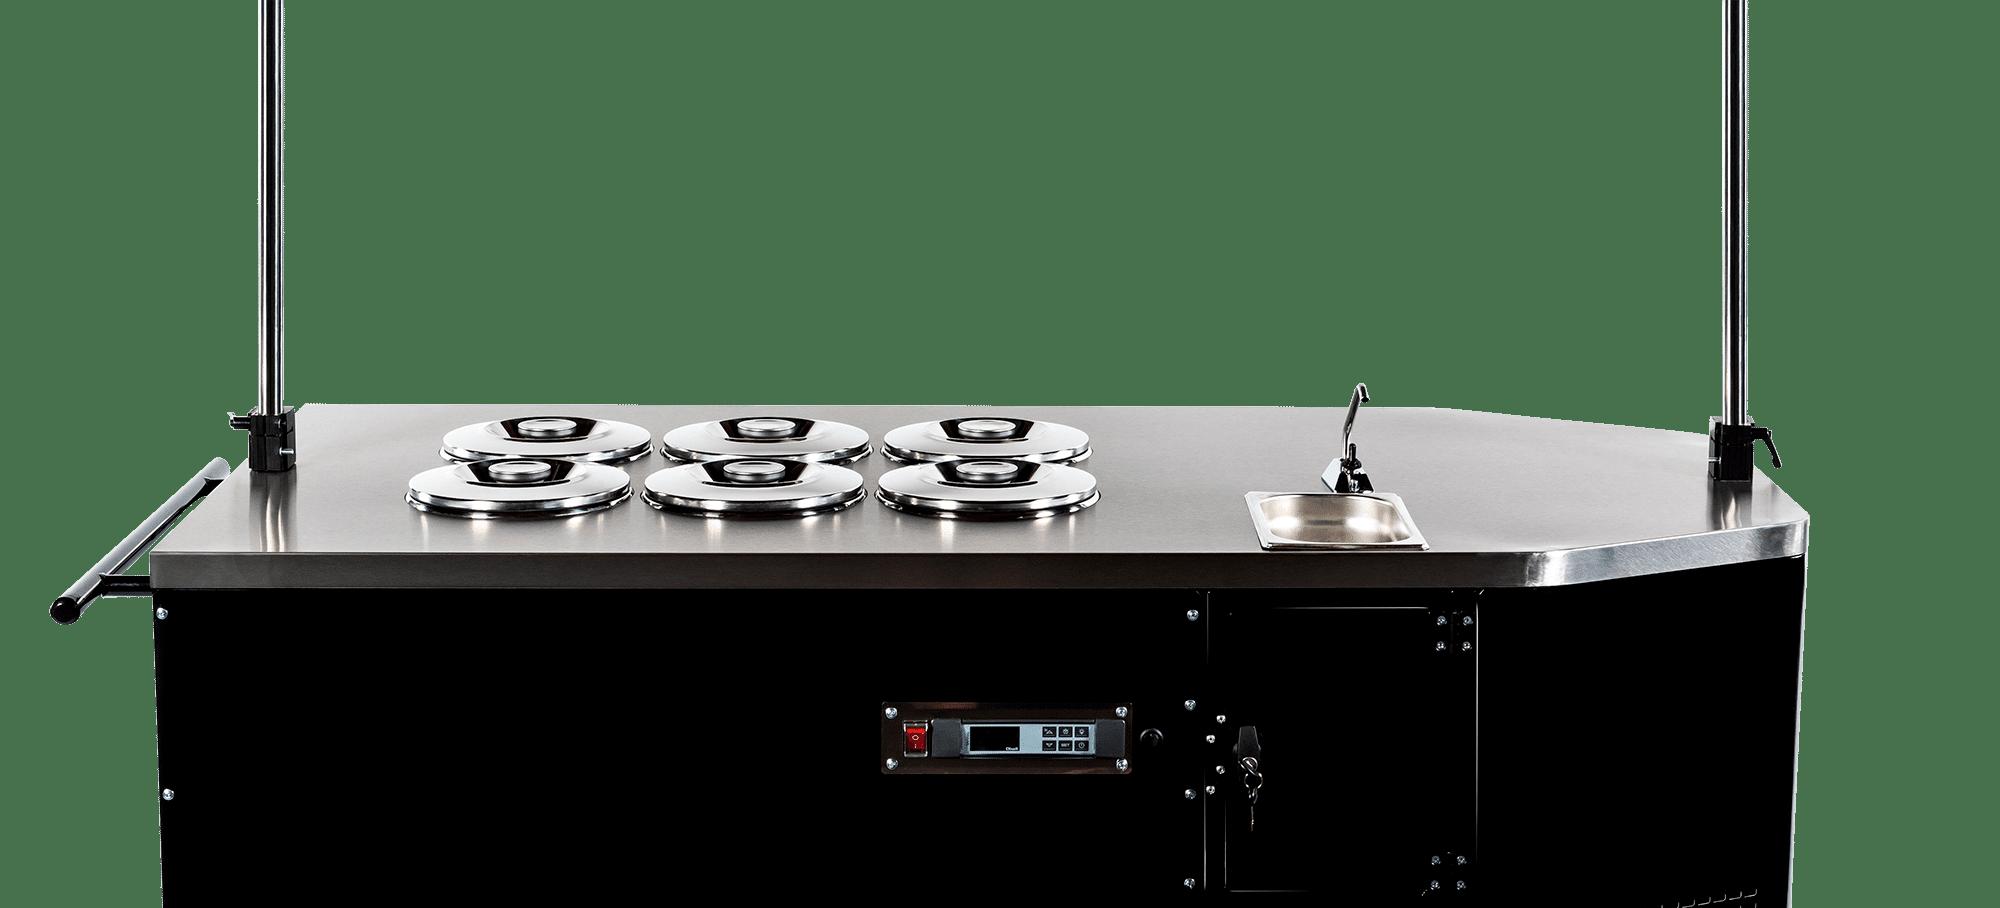 Pozzetti gelato cart countertop equipment